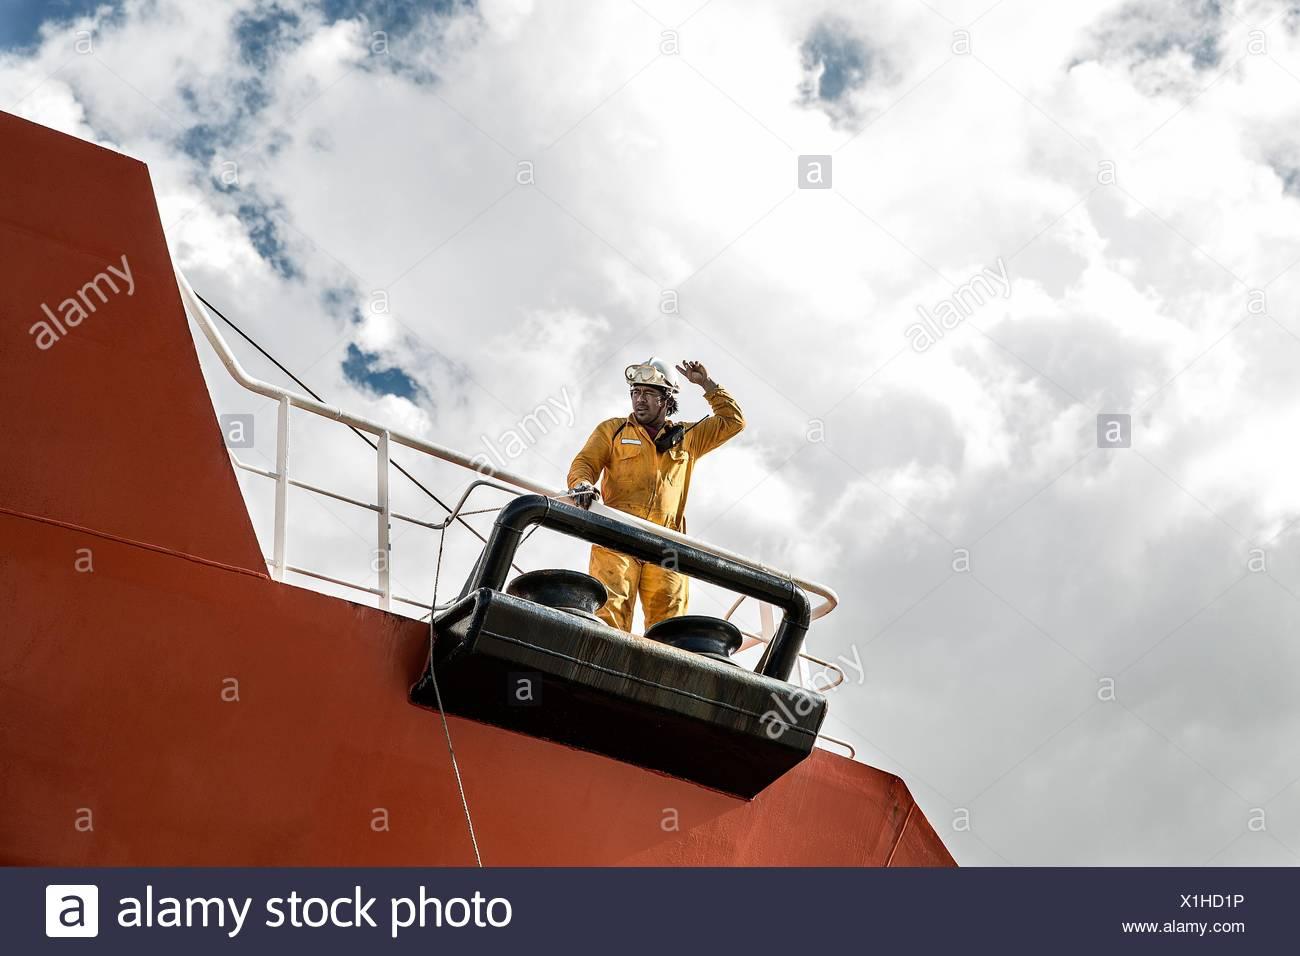 Worker mooring oil tanker on deck making hand gesture - Stock Image